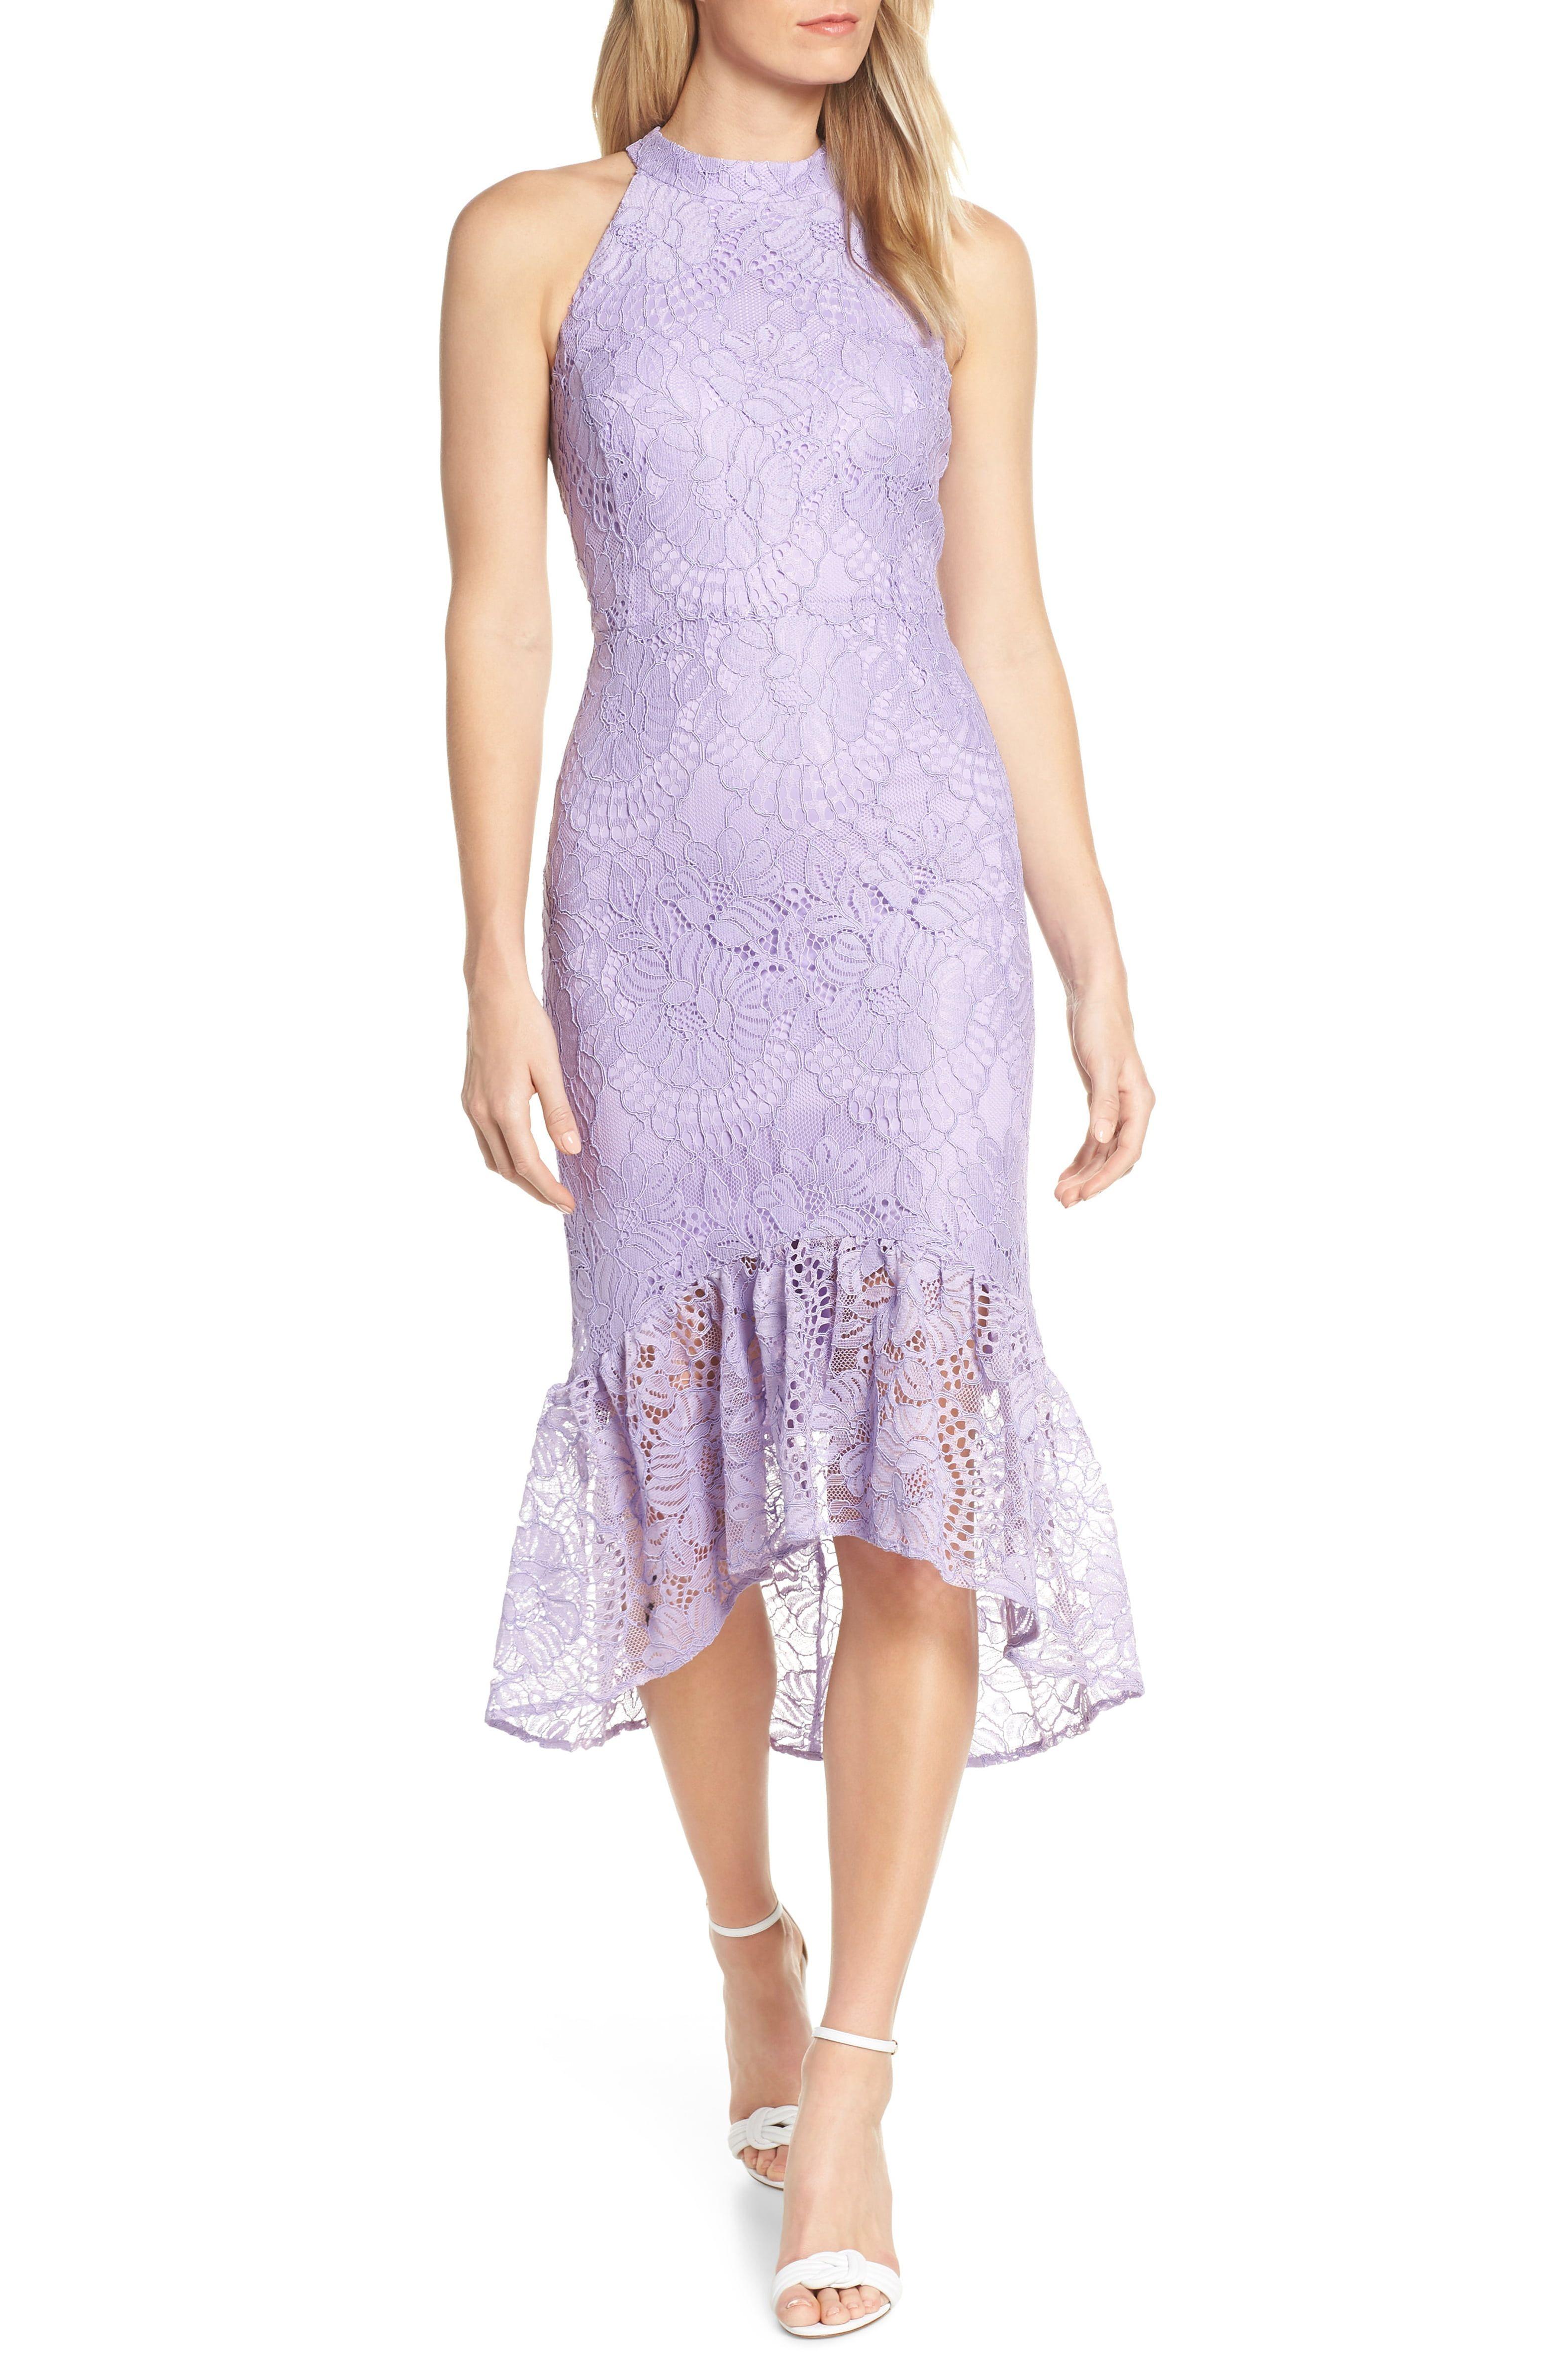 Lavender lace cocktail dress spring wedding guest dresses